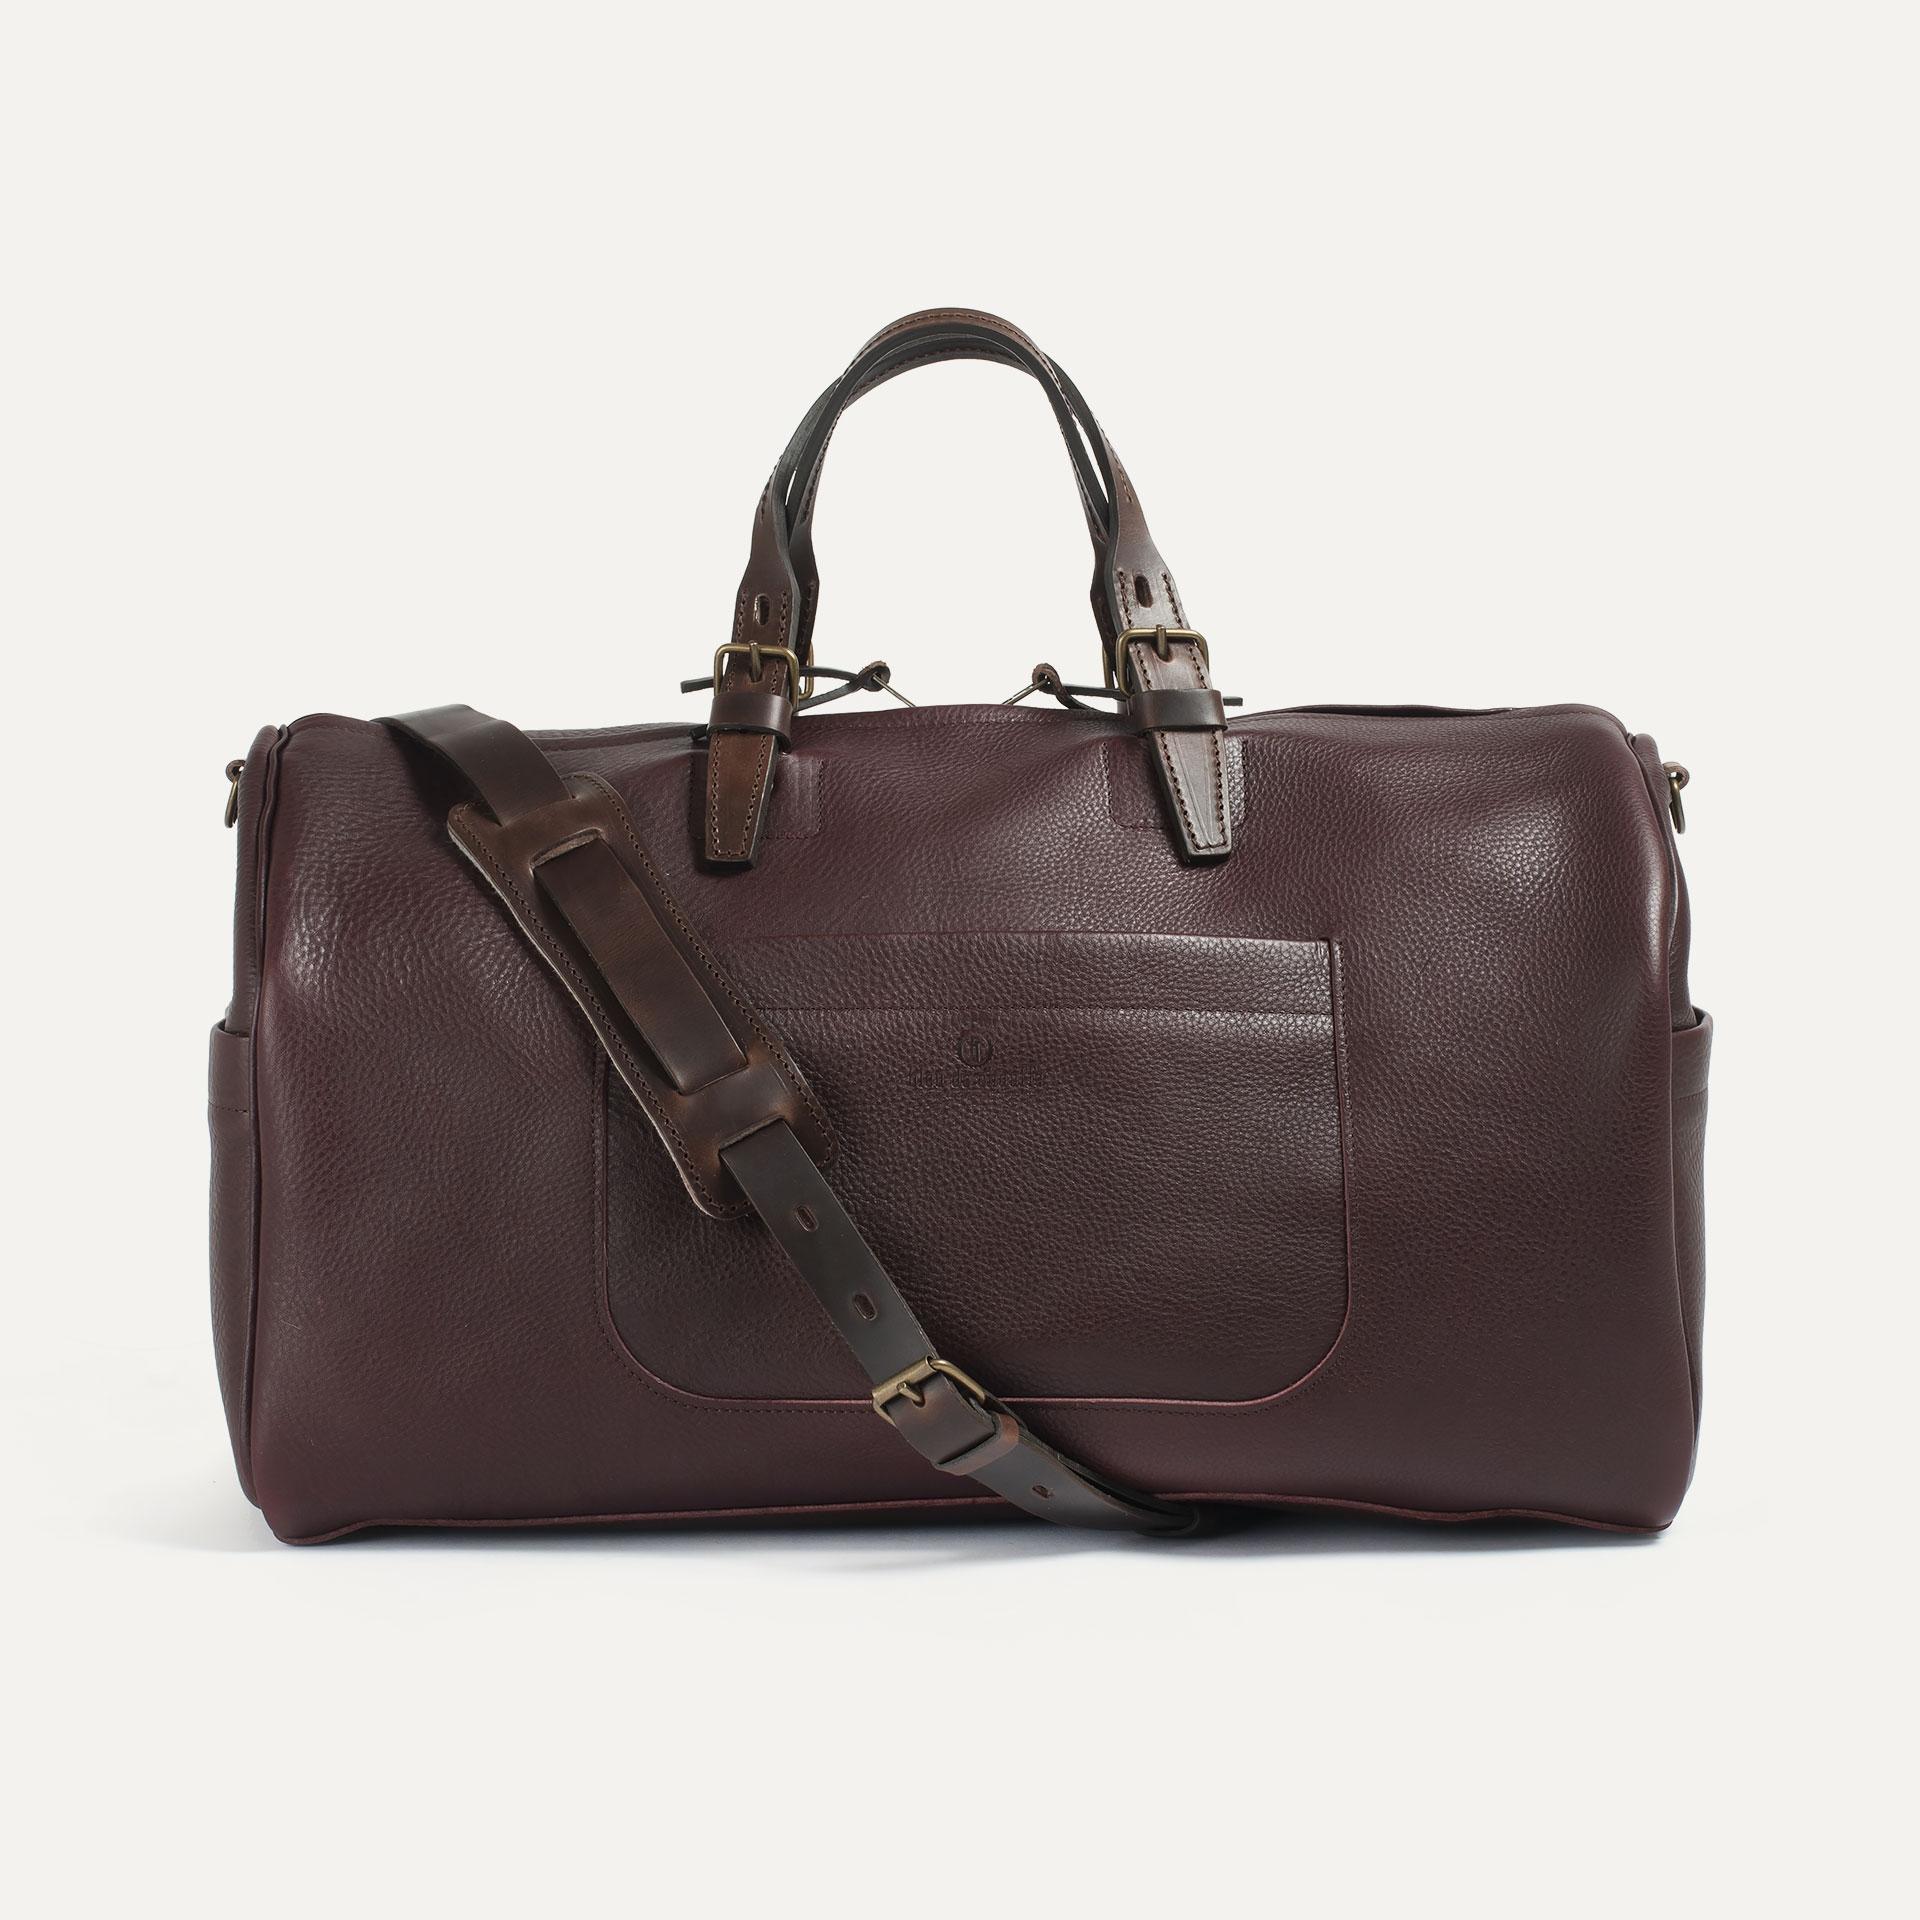 Hobo Travel bag - Peat (image n°1)